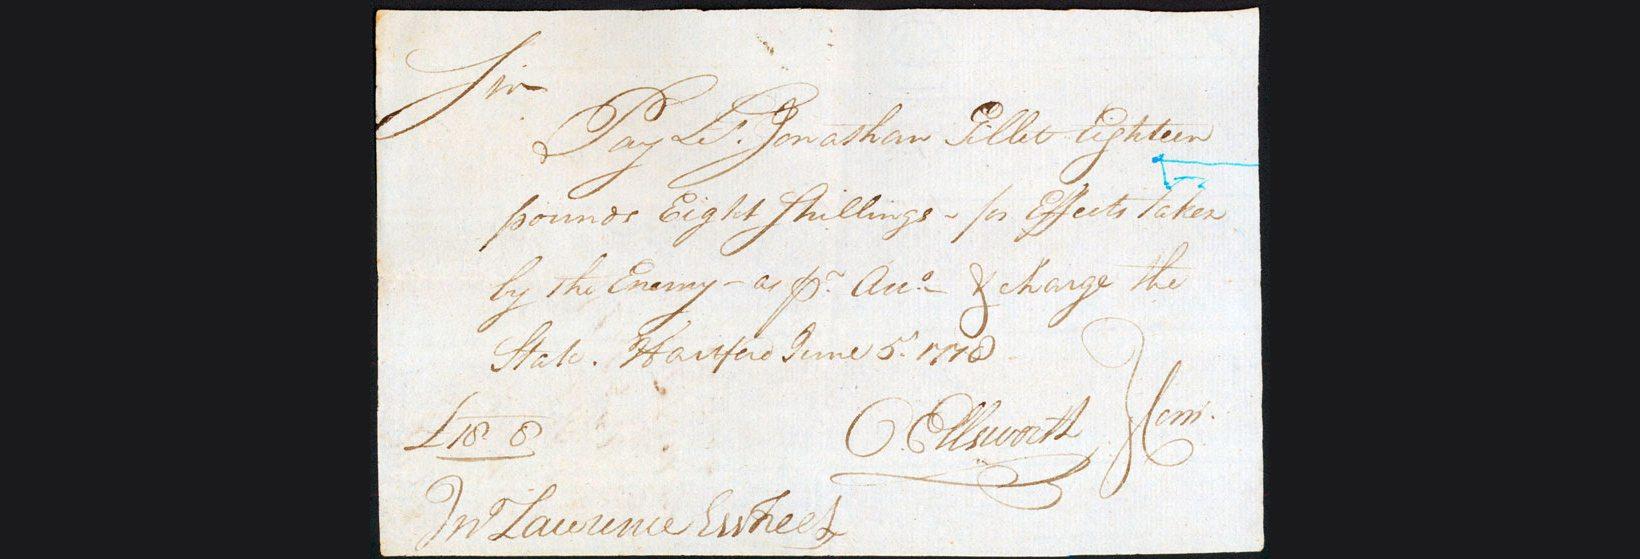 Documents: Tracing Capt. Jonathan Gillet (1720-1786 regarding Jonathan Name Tracing